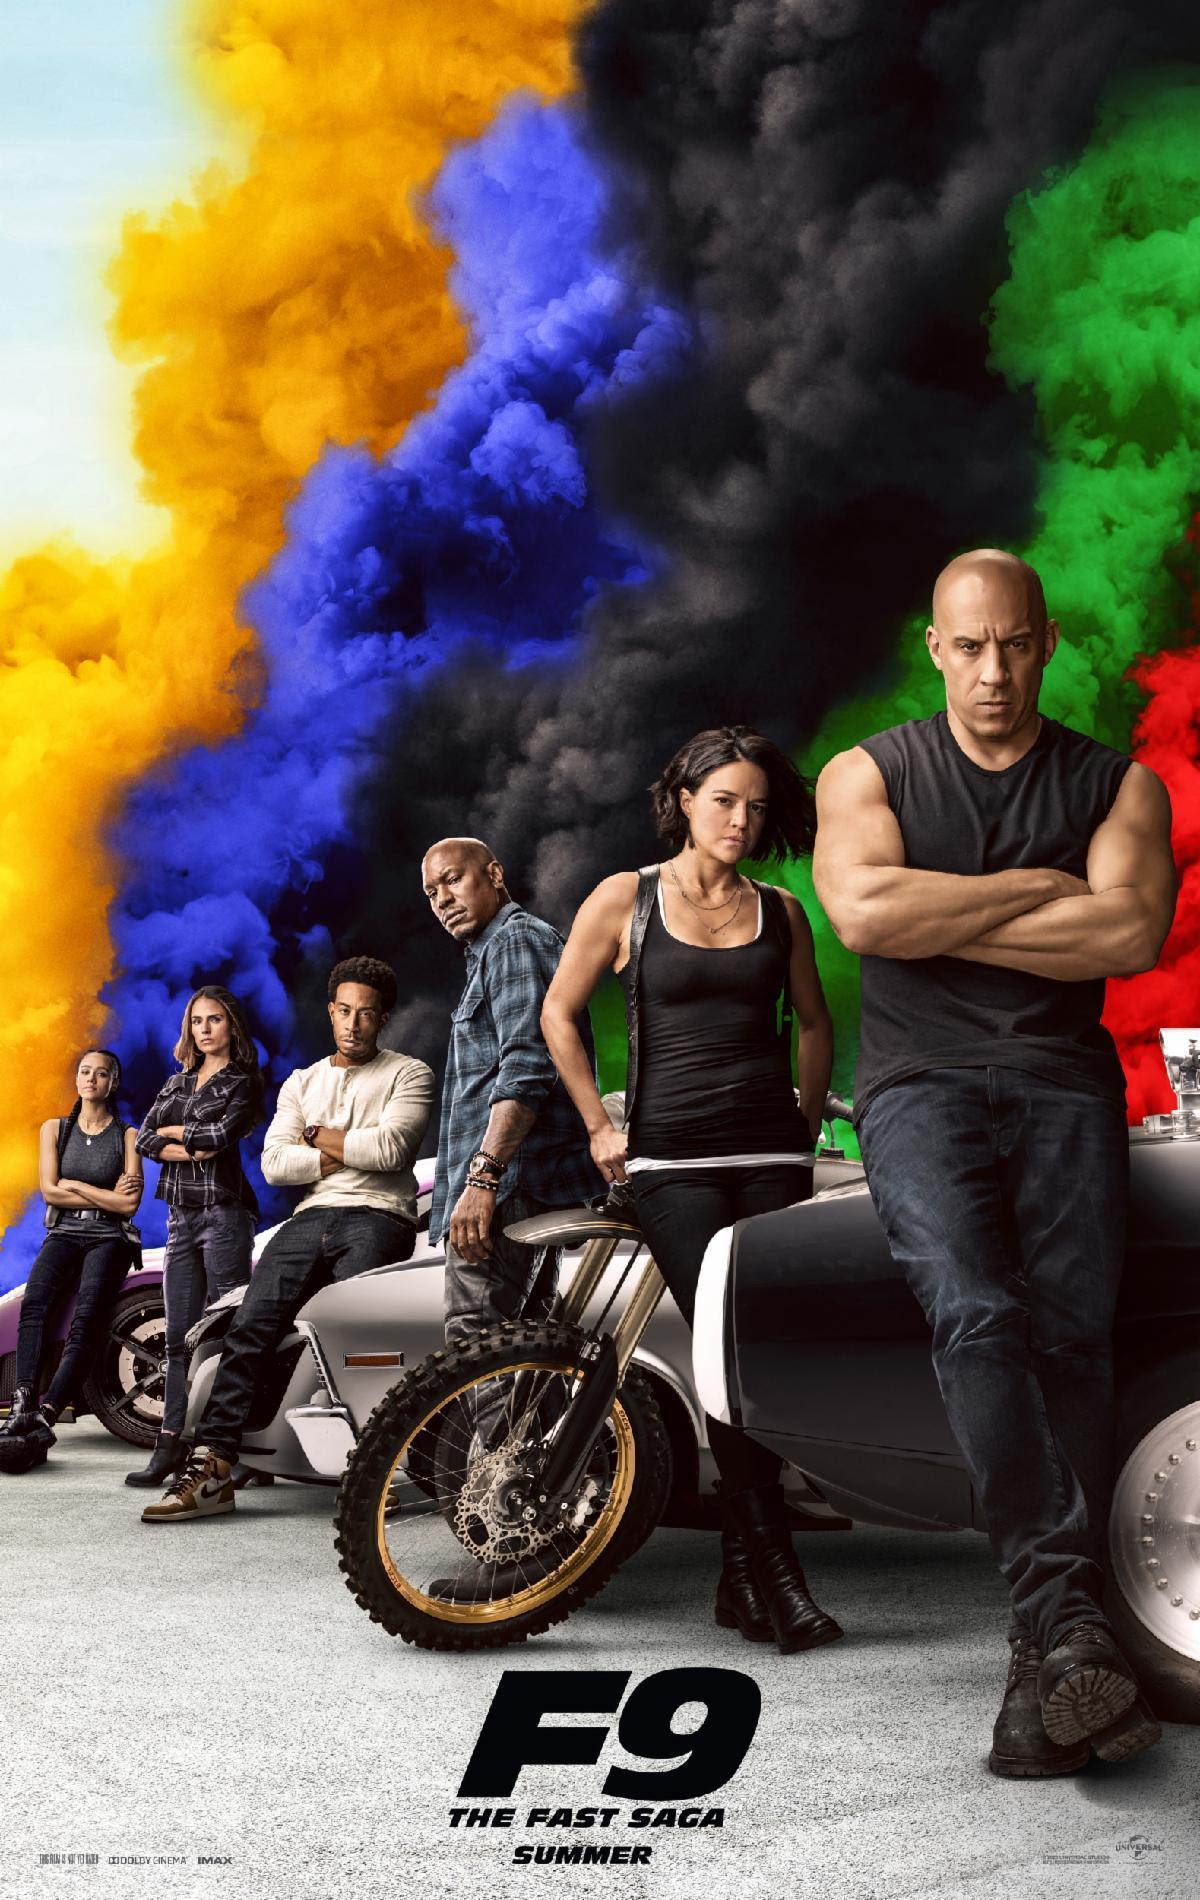 Velozes & Furiosos 9 - Filme 2020 - AdoroCinema